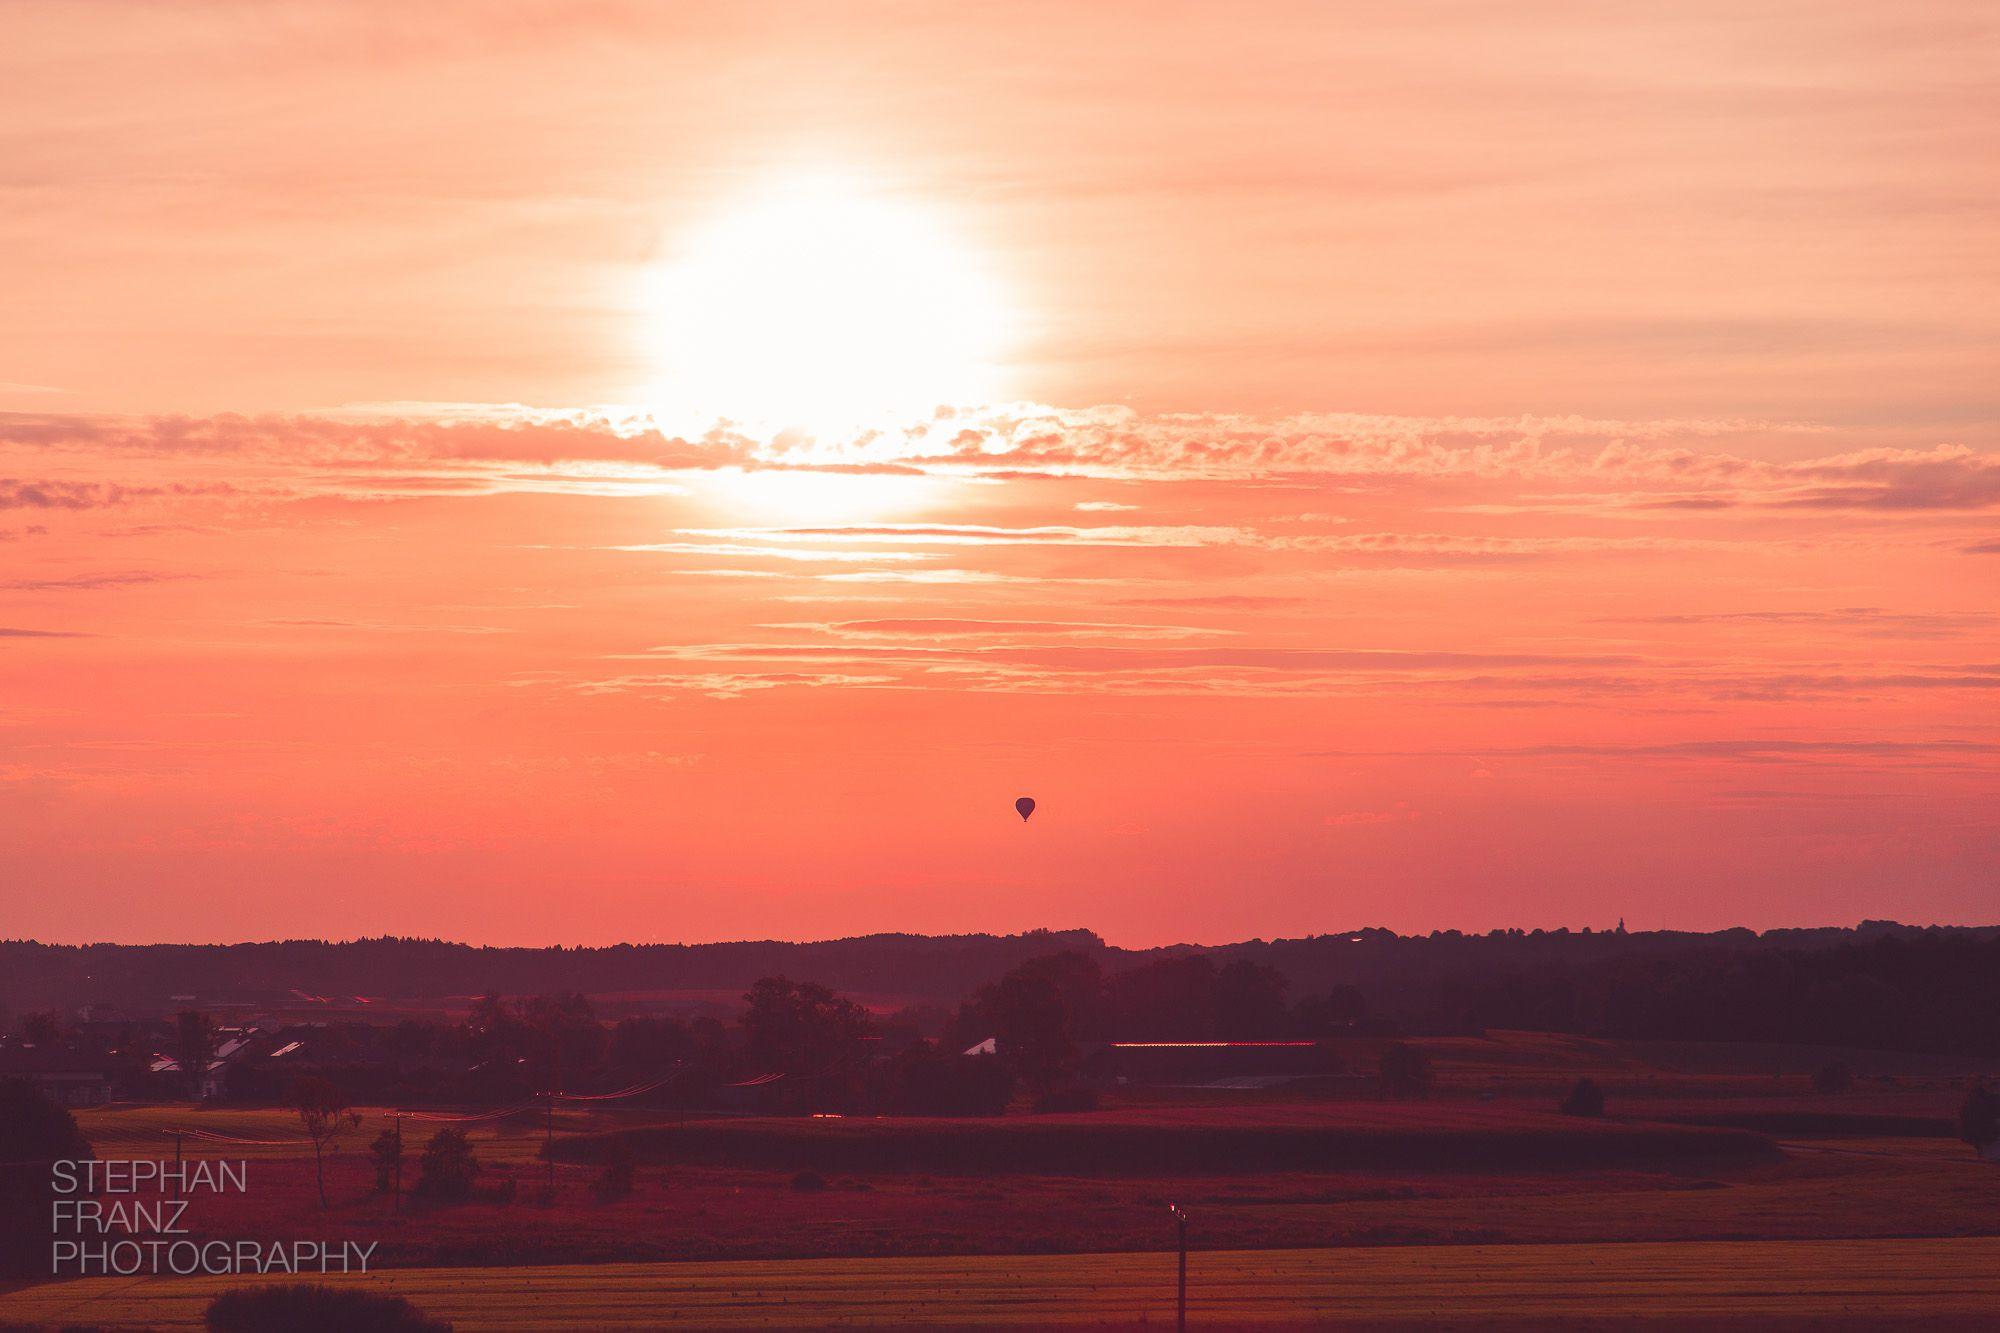 Sonnenuntergang-Ballon-Bayern-Stephan-Franz-Fotograf-Photography-2